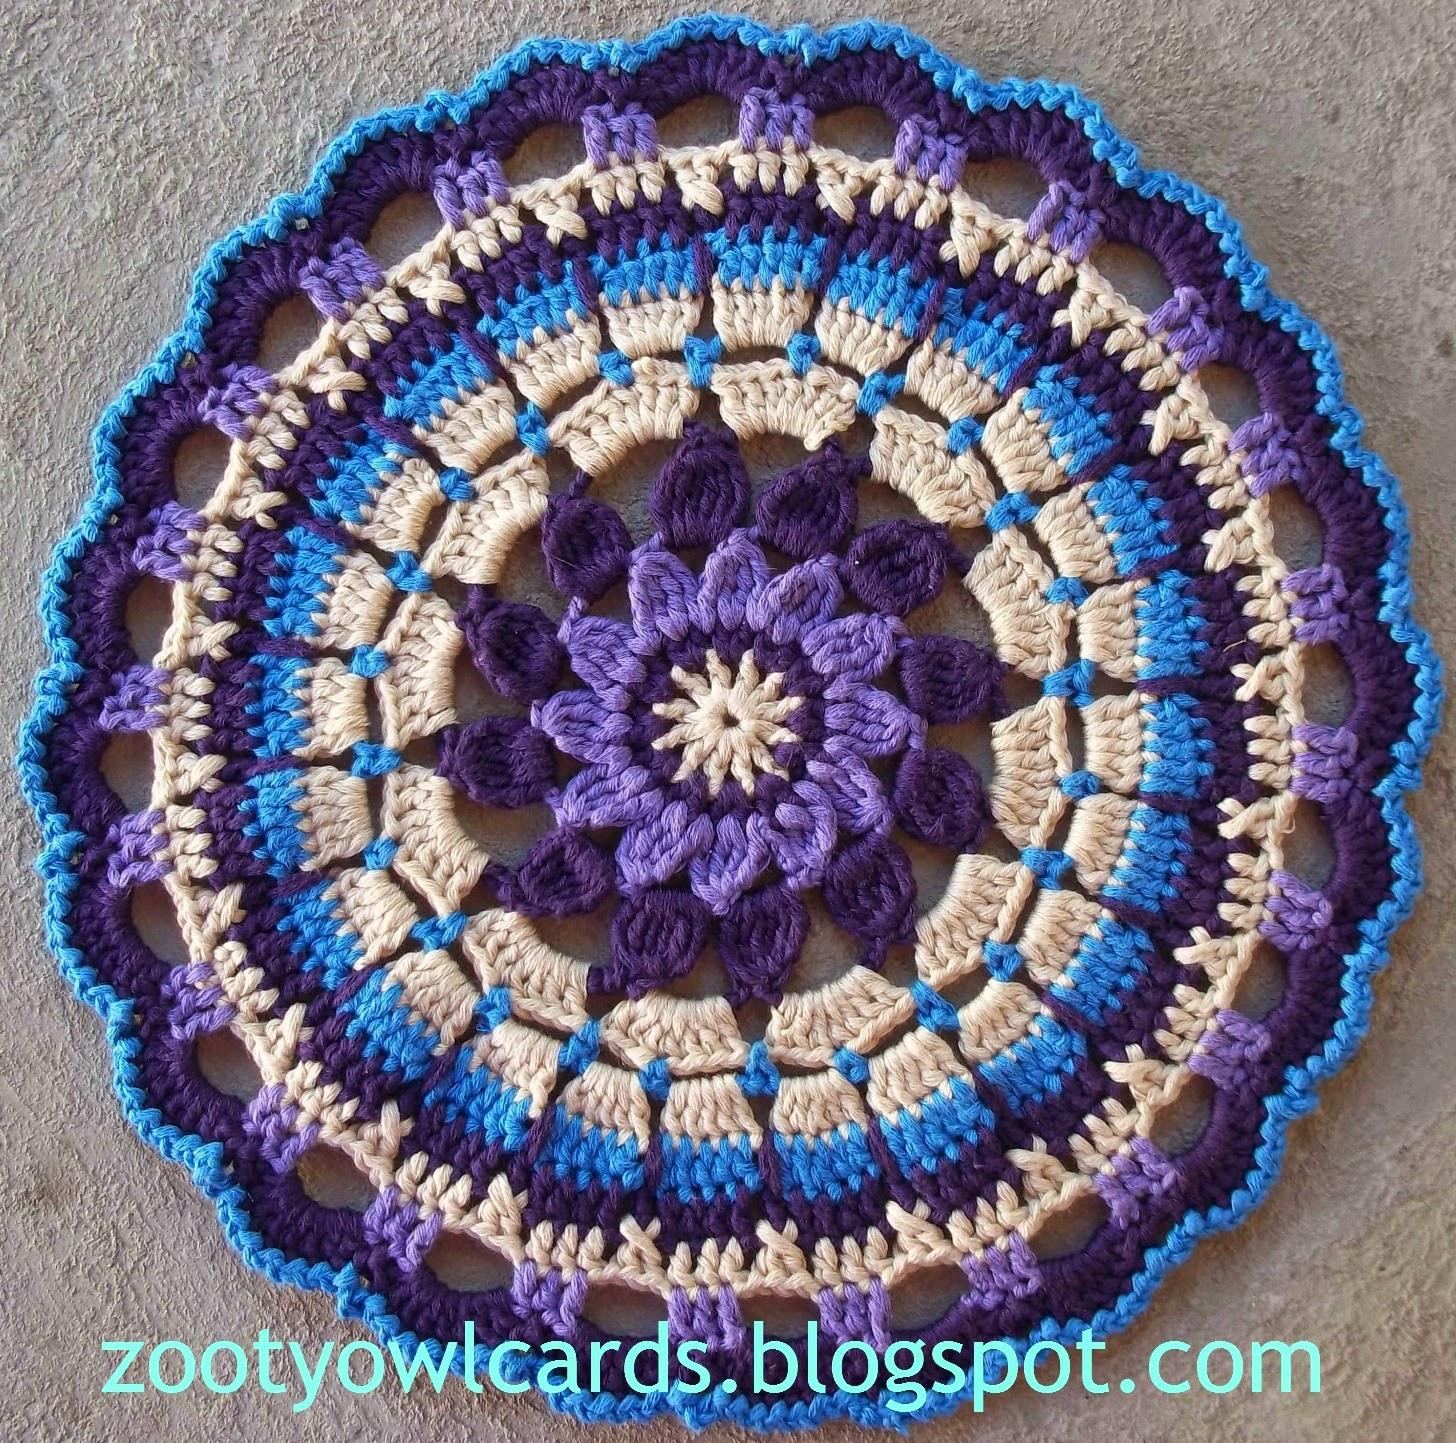 Crochet Free Pattern Mandala : Zooty Owls Crafty Blog: Dahlia Mandala: Pattern